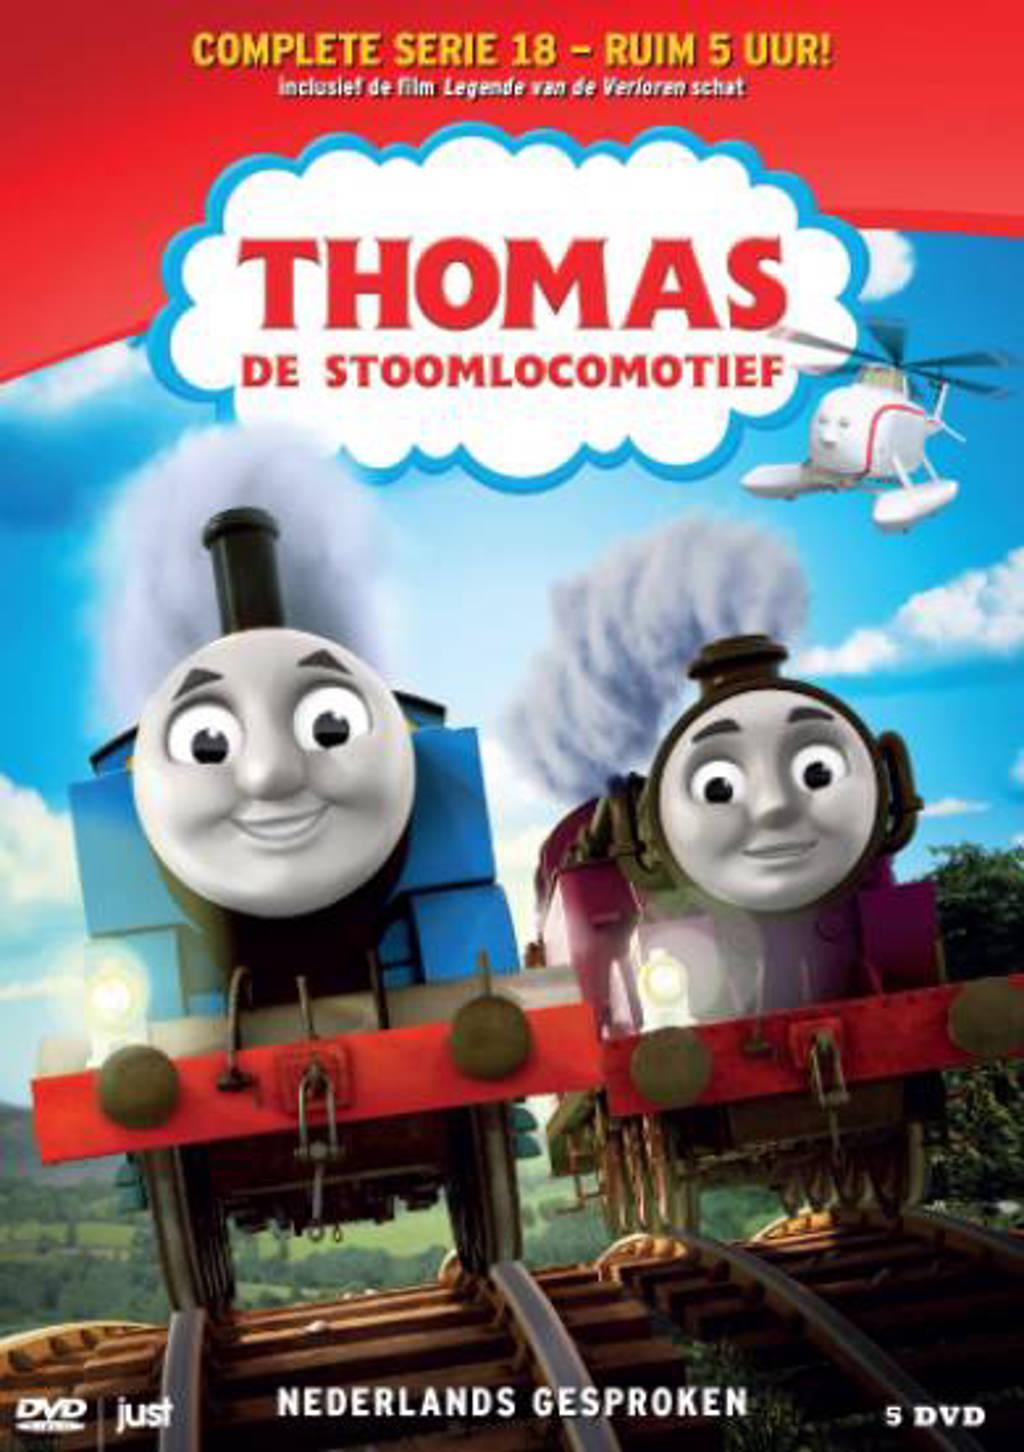 Thomas de stoomlocomotief 18 (DVD)